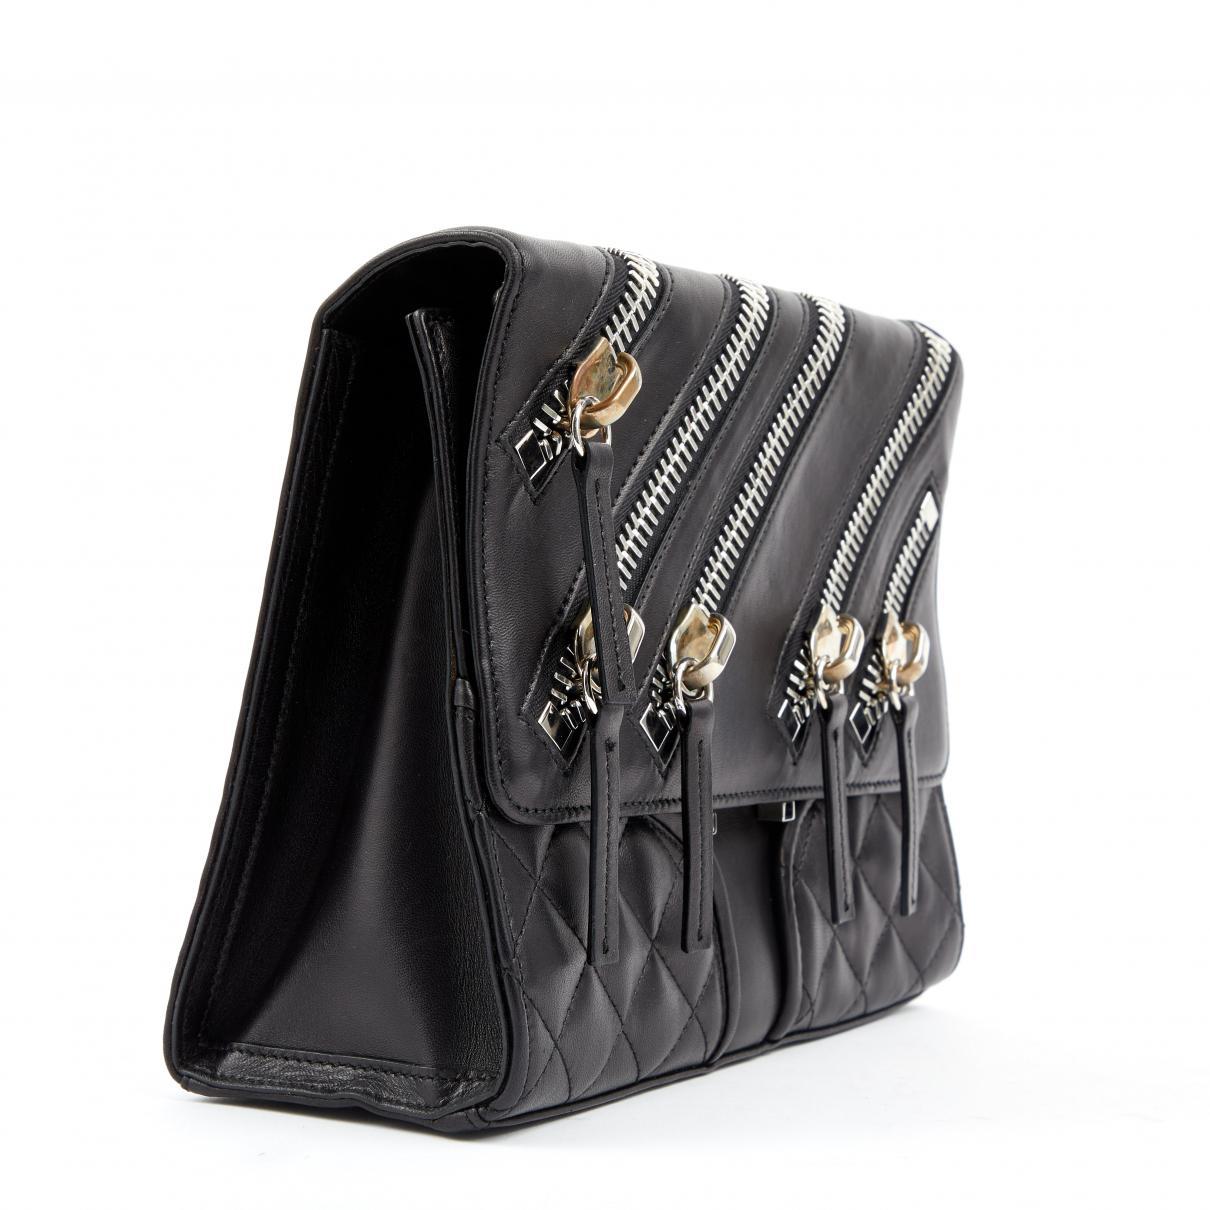 Giuseppe Zanotti Pre-owned - Leather crossbody bag 4eQyDu